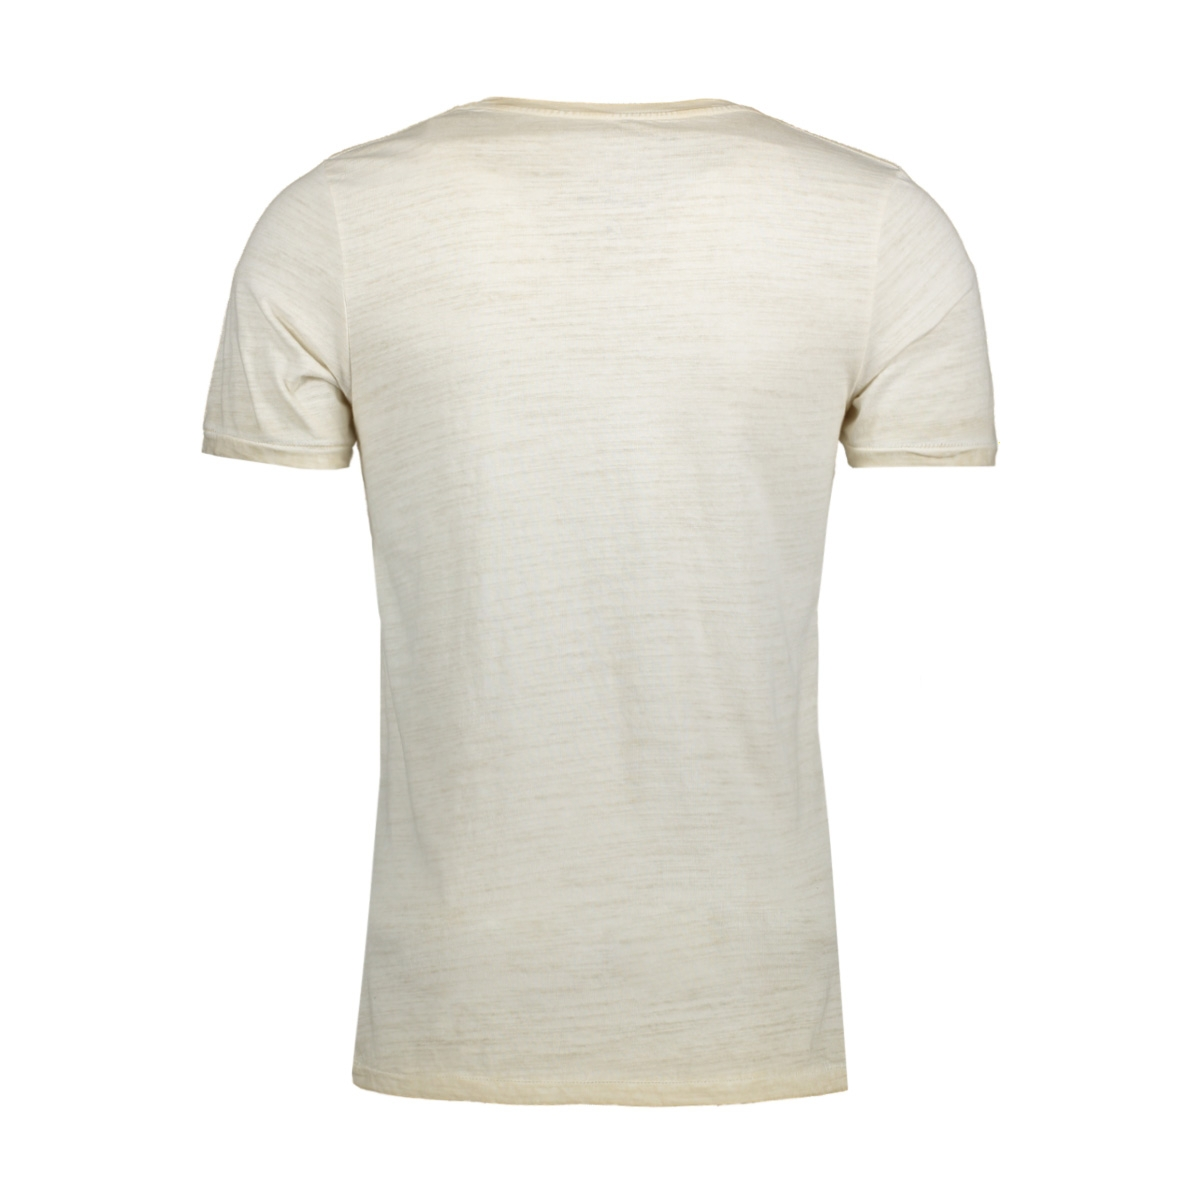 jjvblues tee ss crew neck 12123170 jack & jones t-shirt fog/slim fit